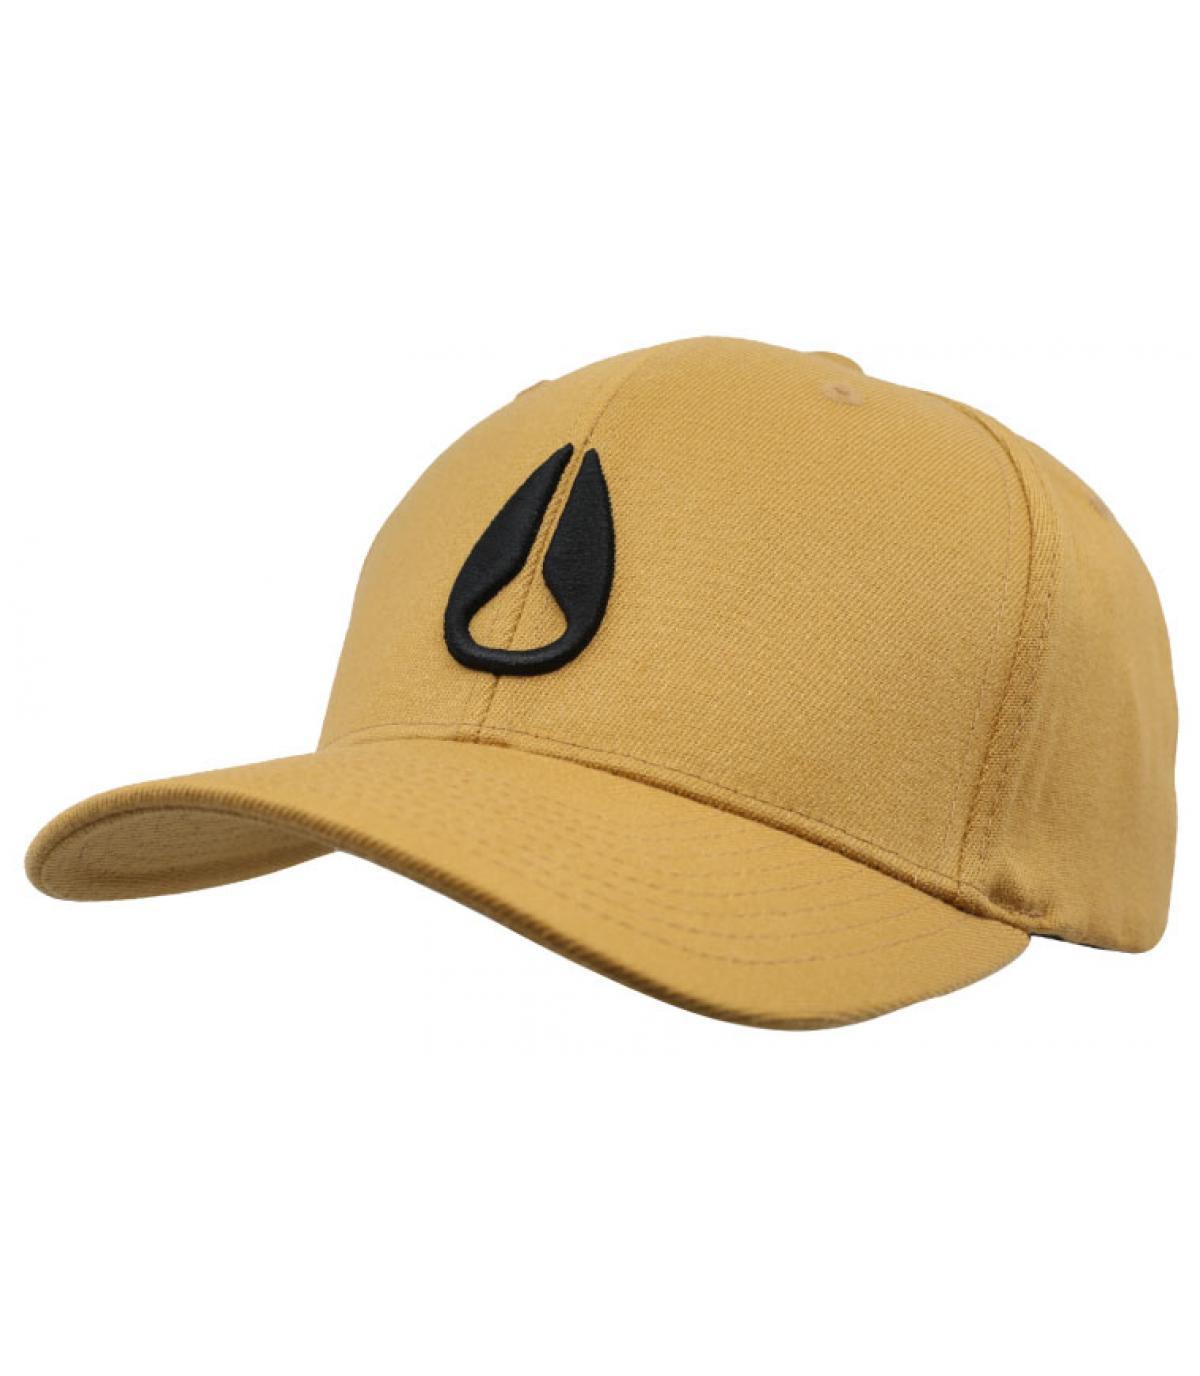 beige Nixon cap